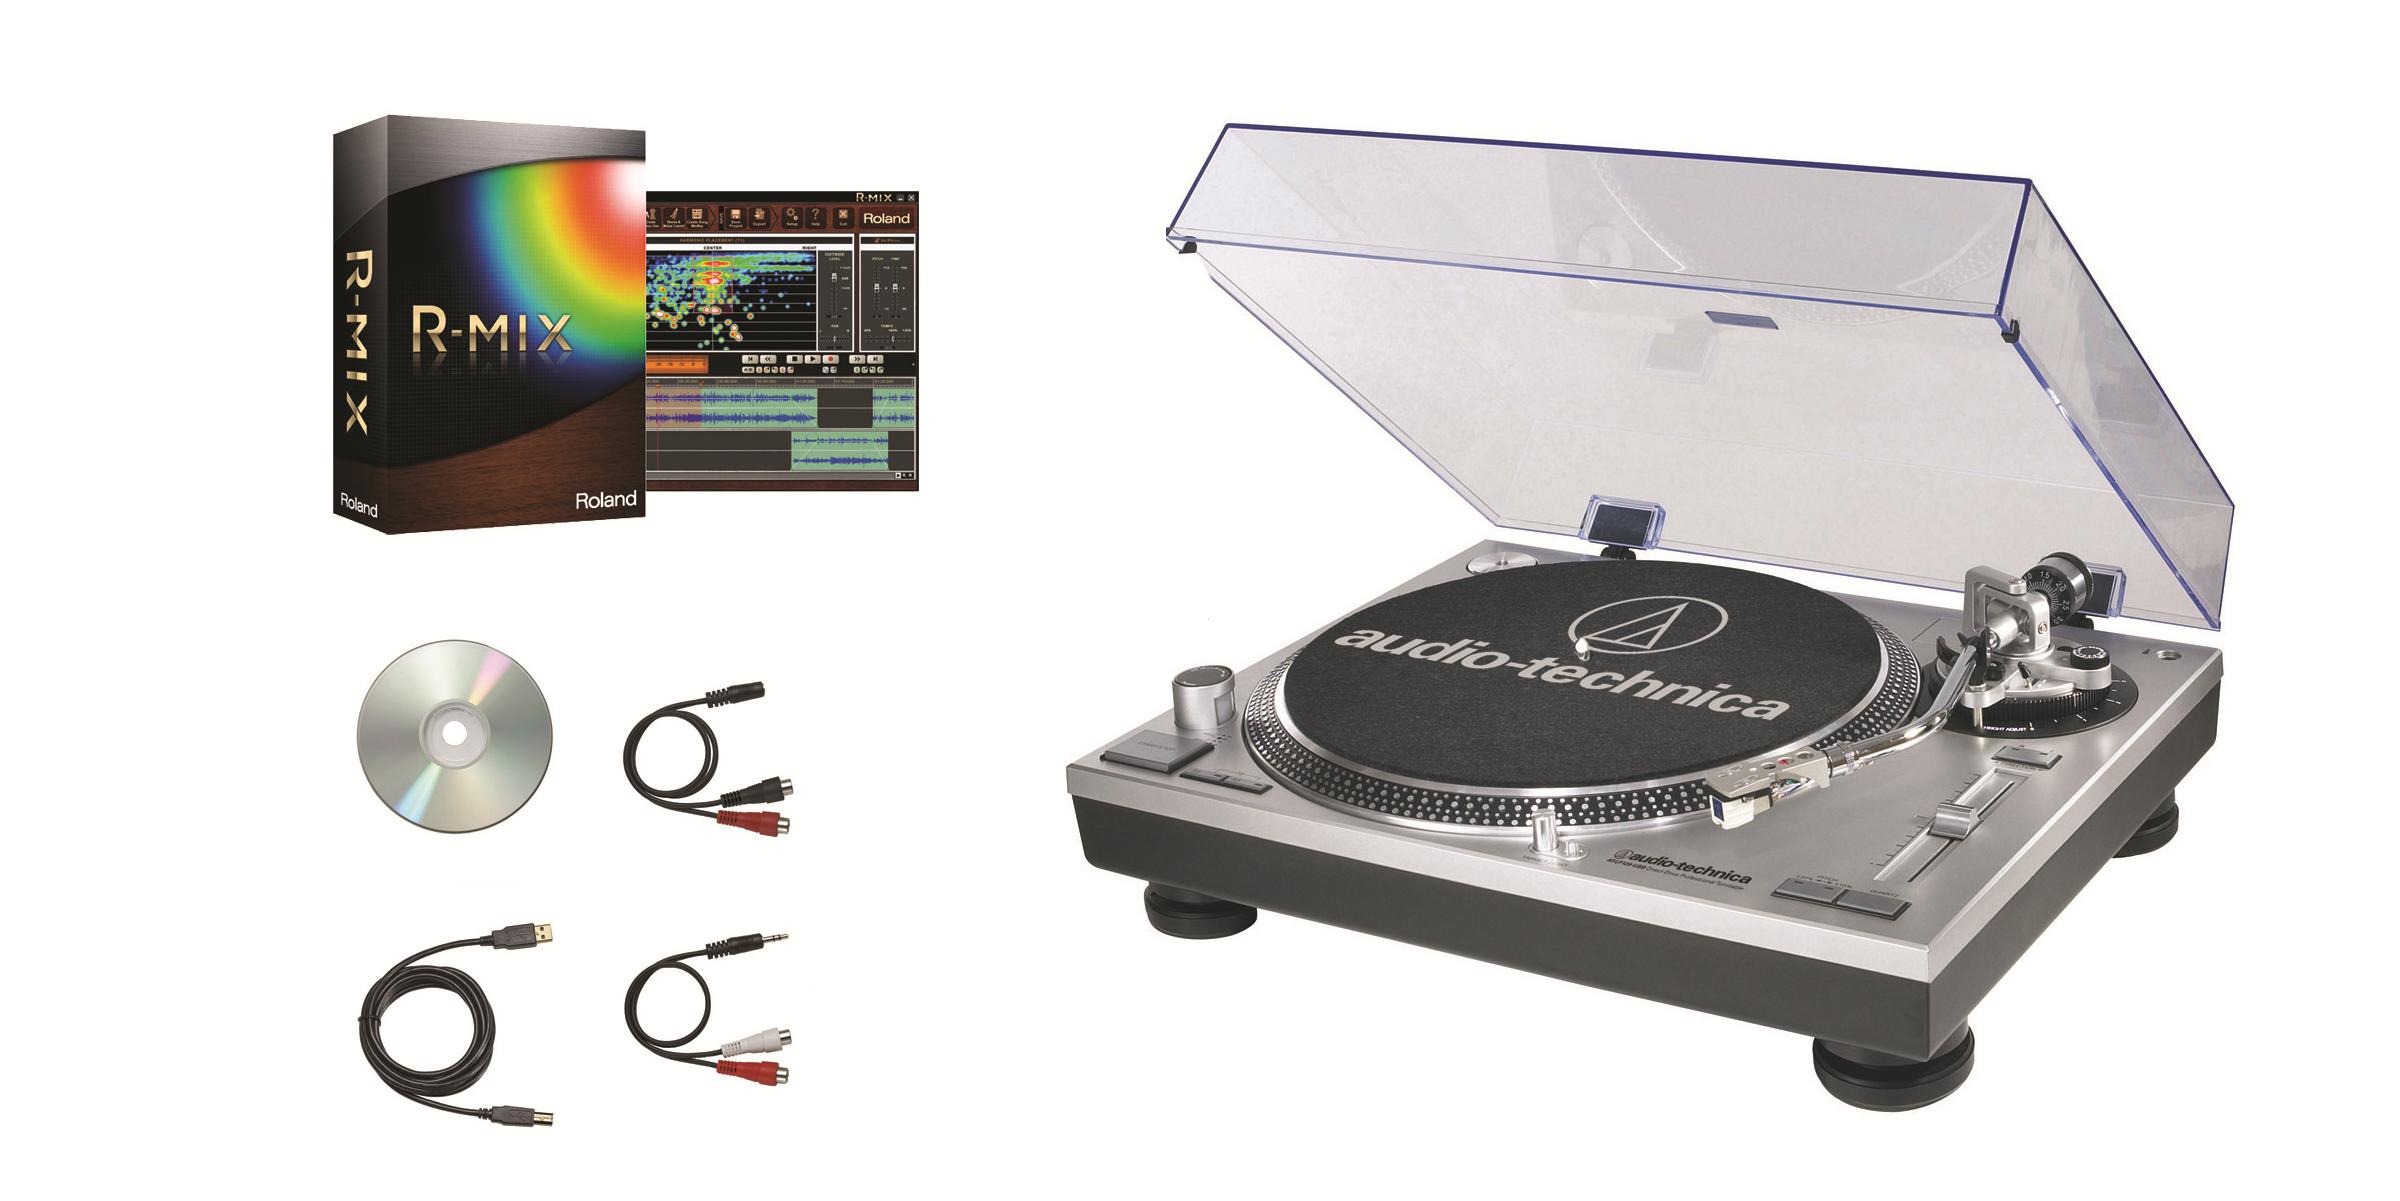 Amazon.com: audio-technica-usb direct-drive Turntable ...